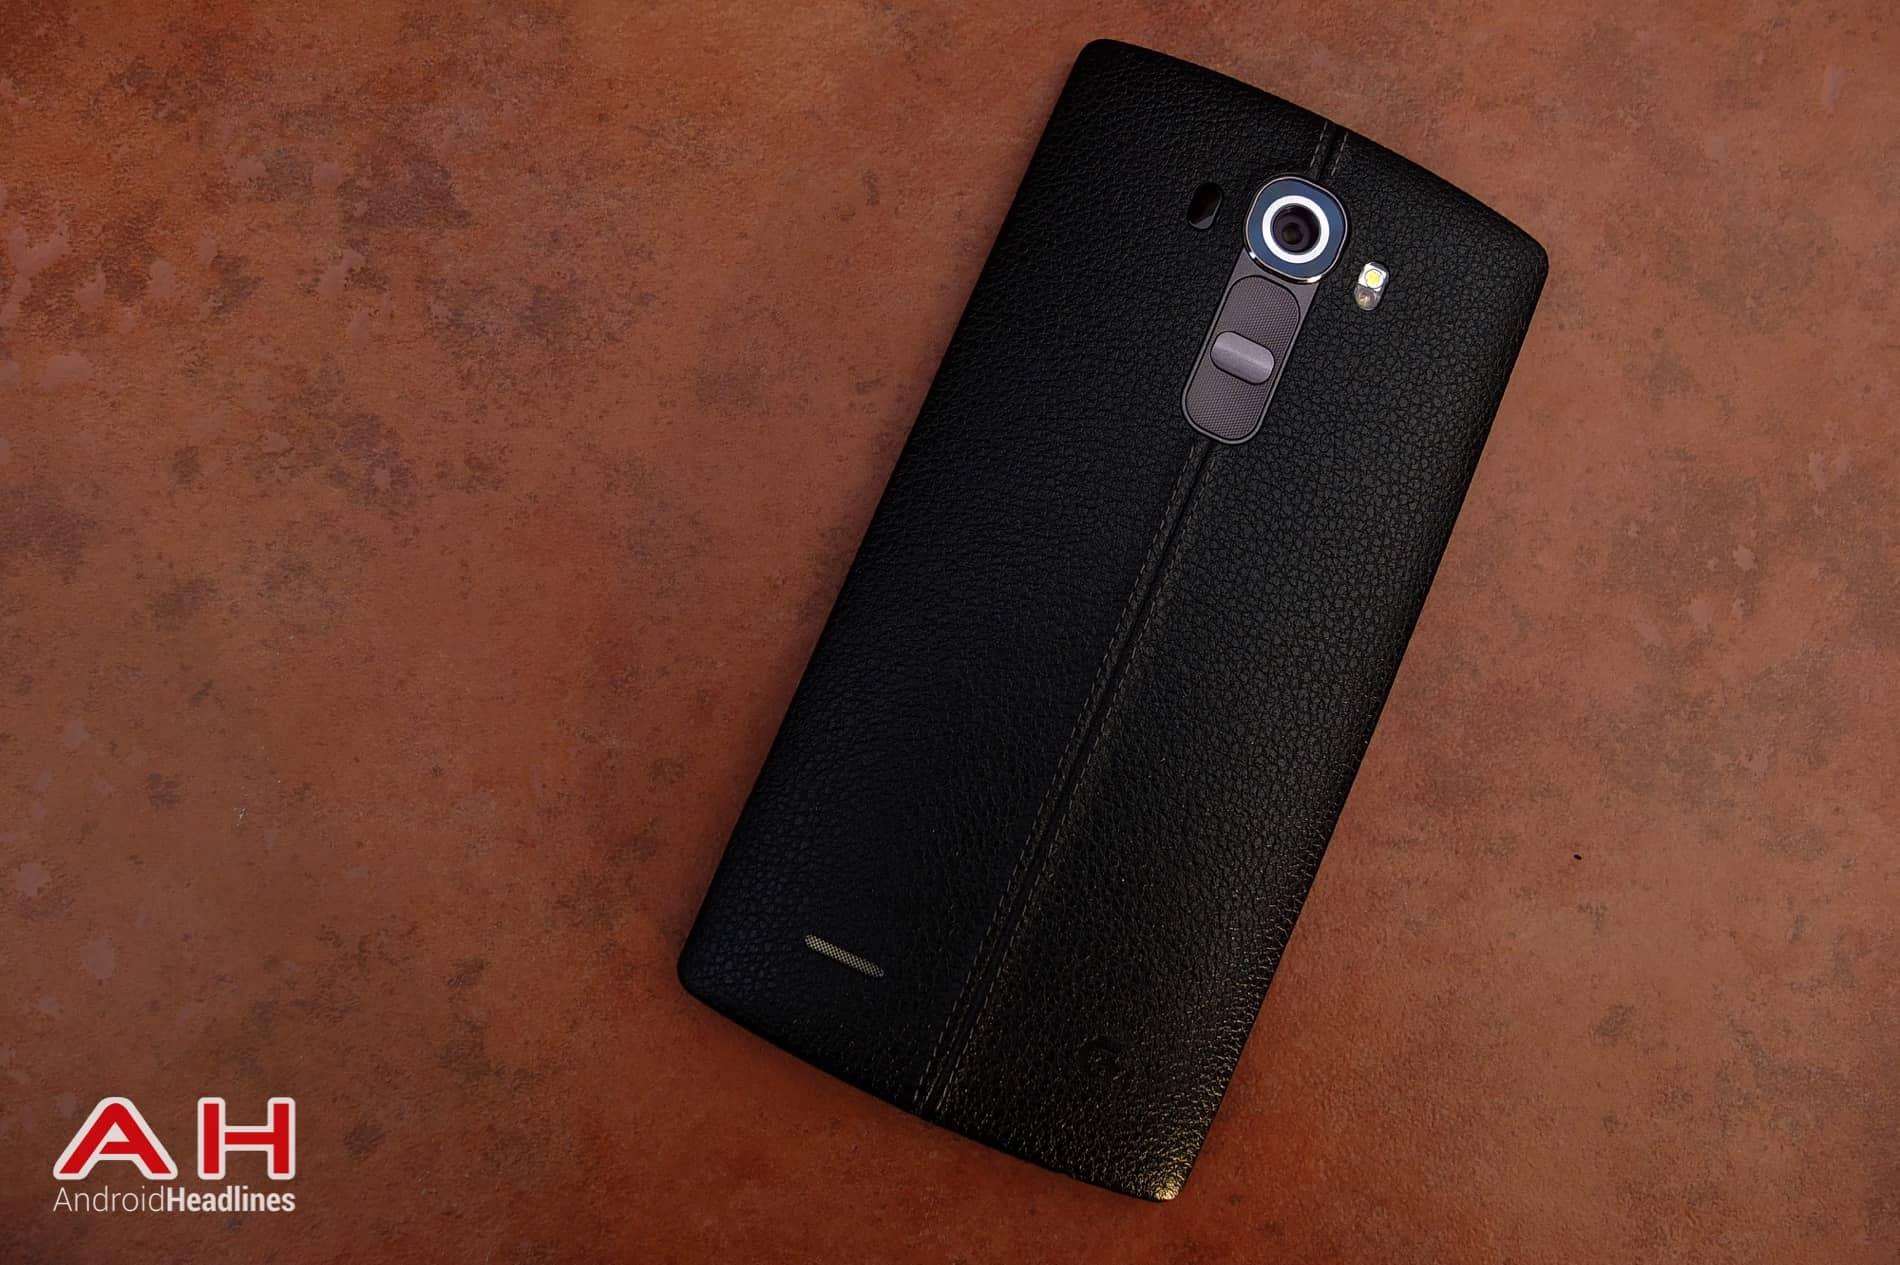 LG G4 BlackLeather TD AH 03